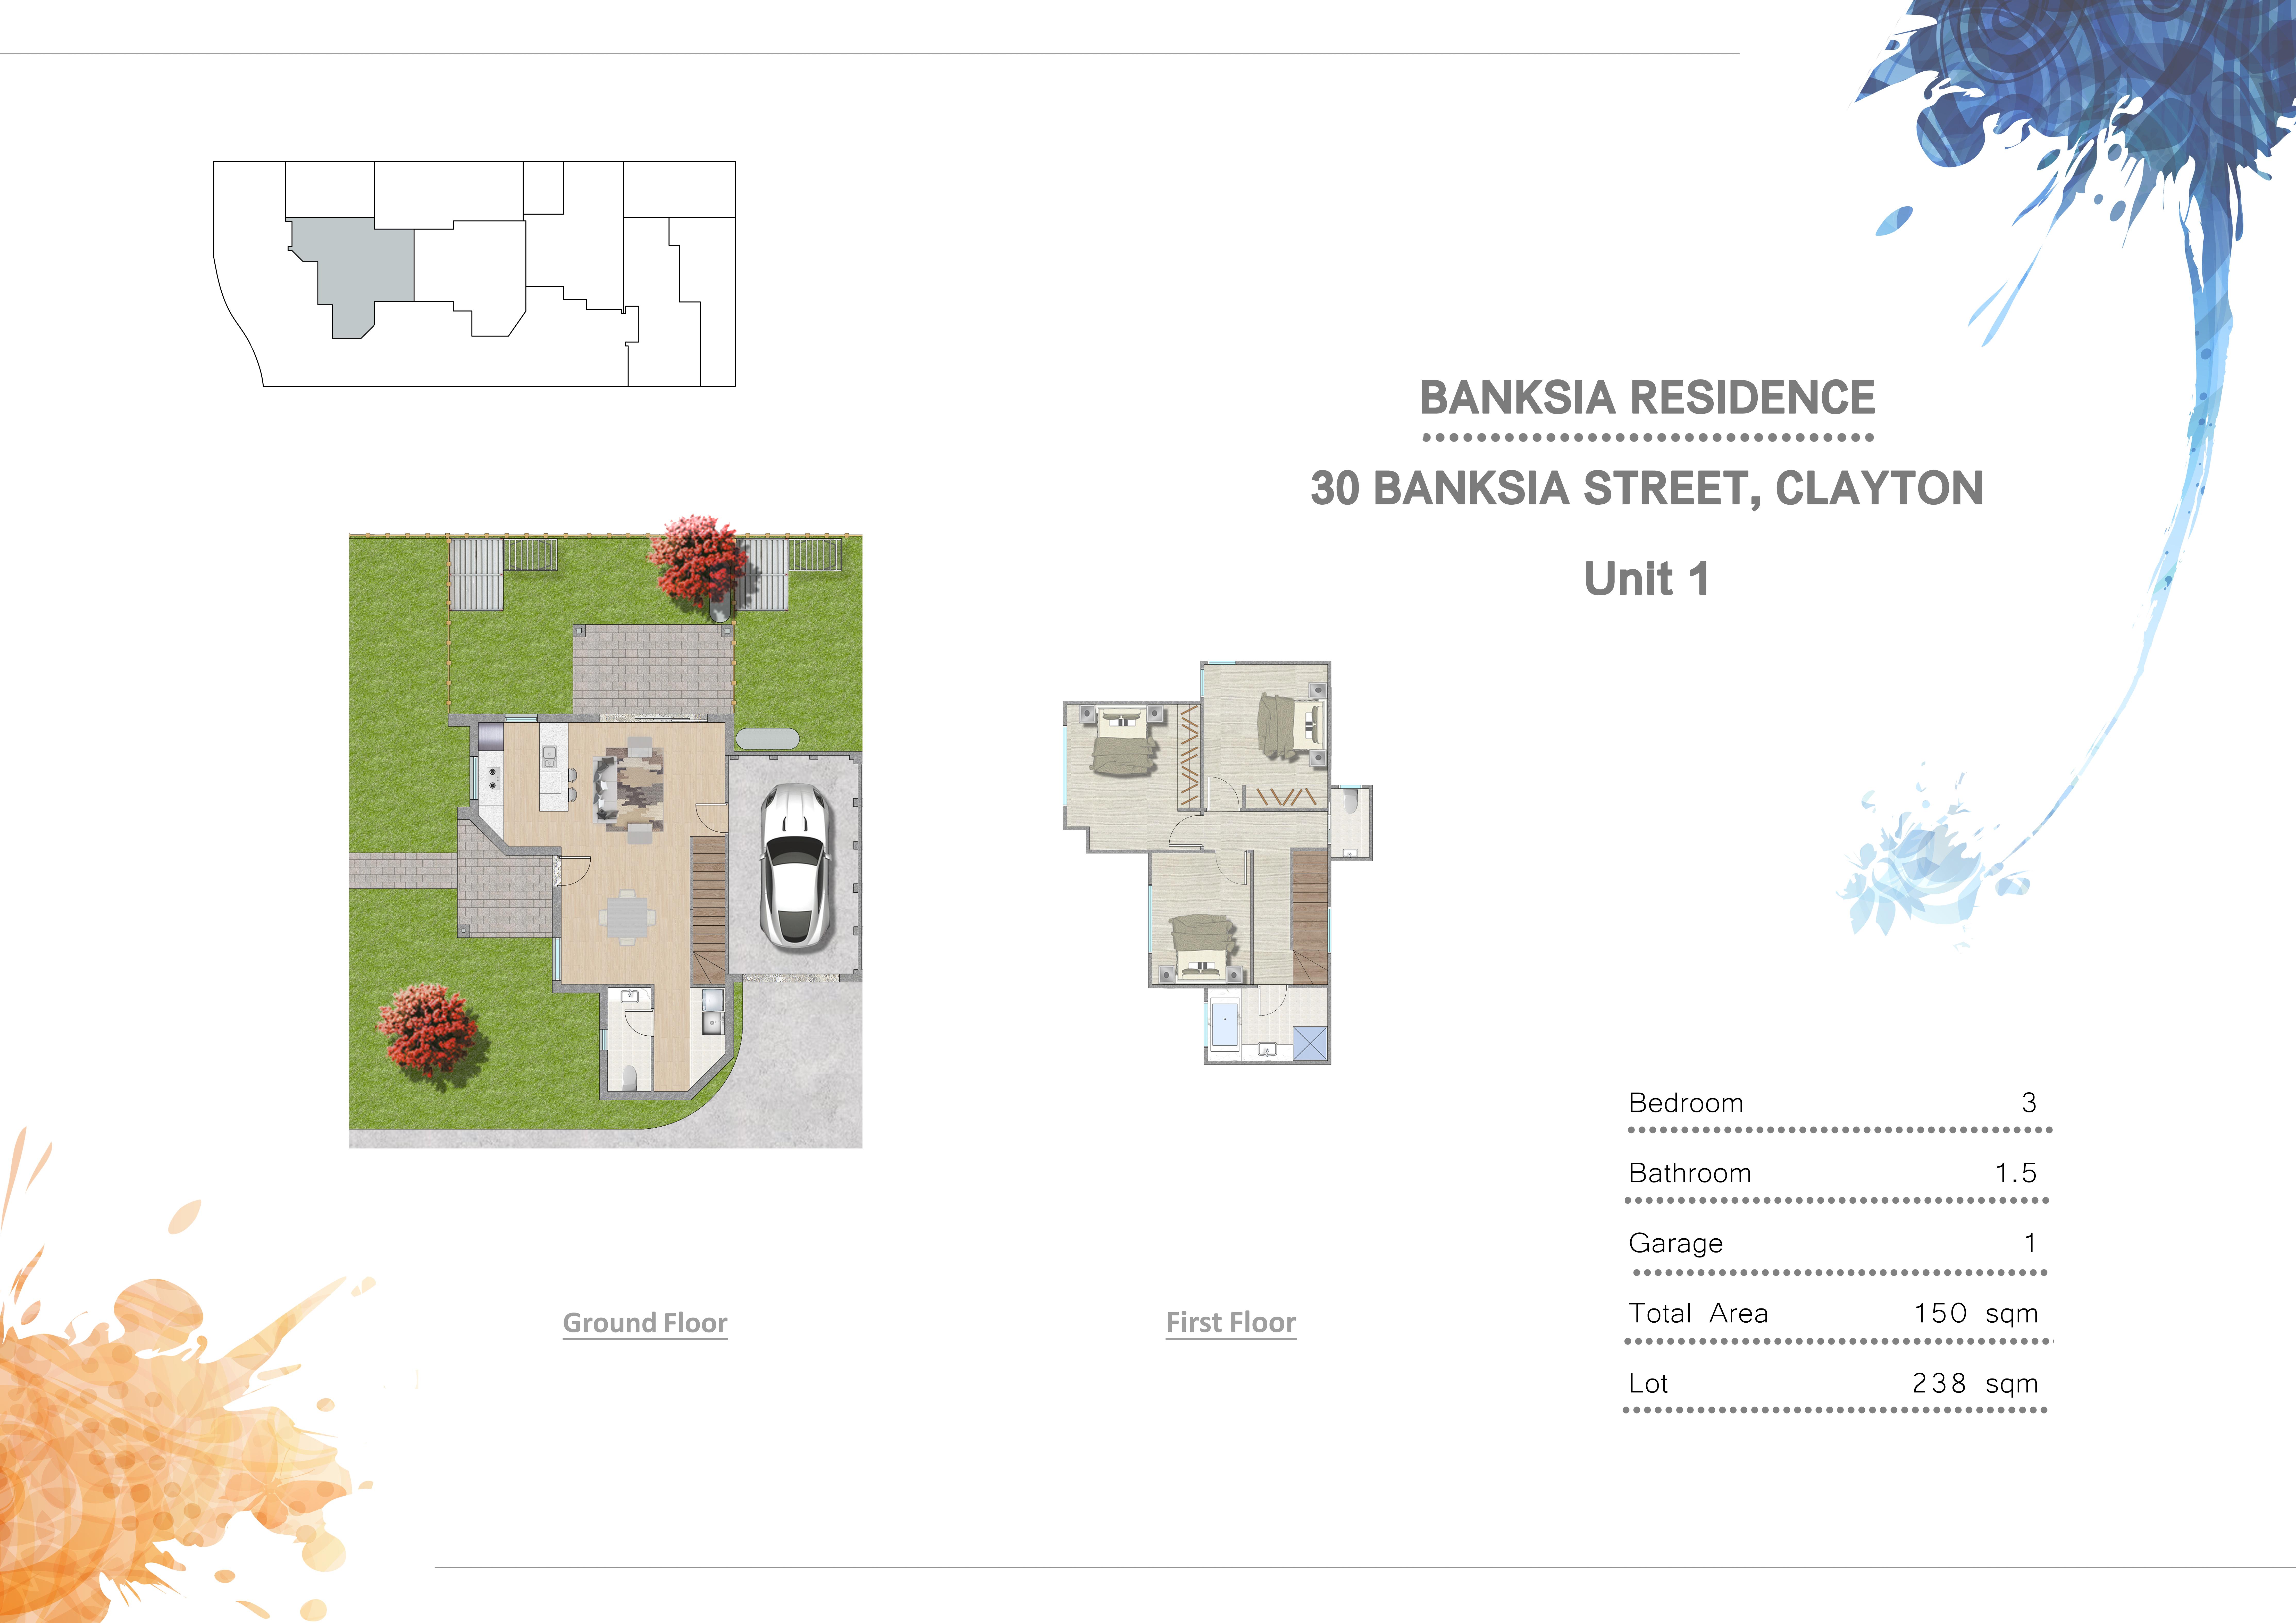 11402_197233_Unit 1 Floor Plan